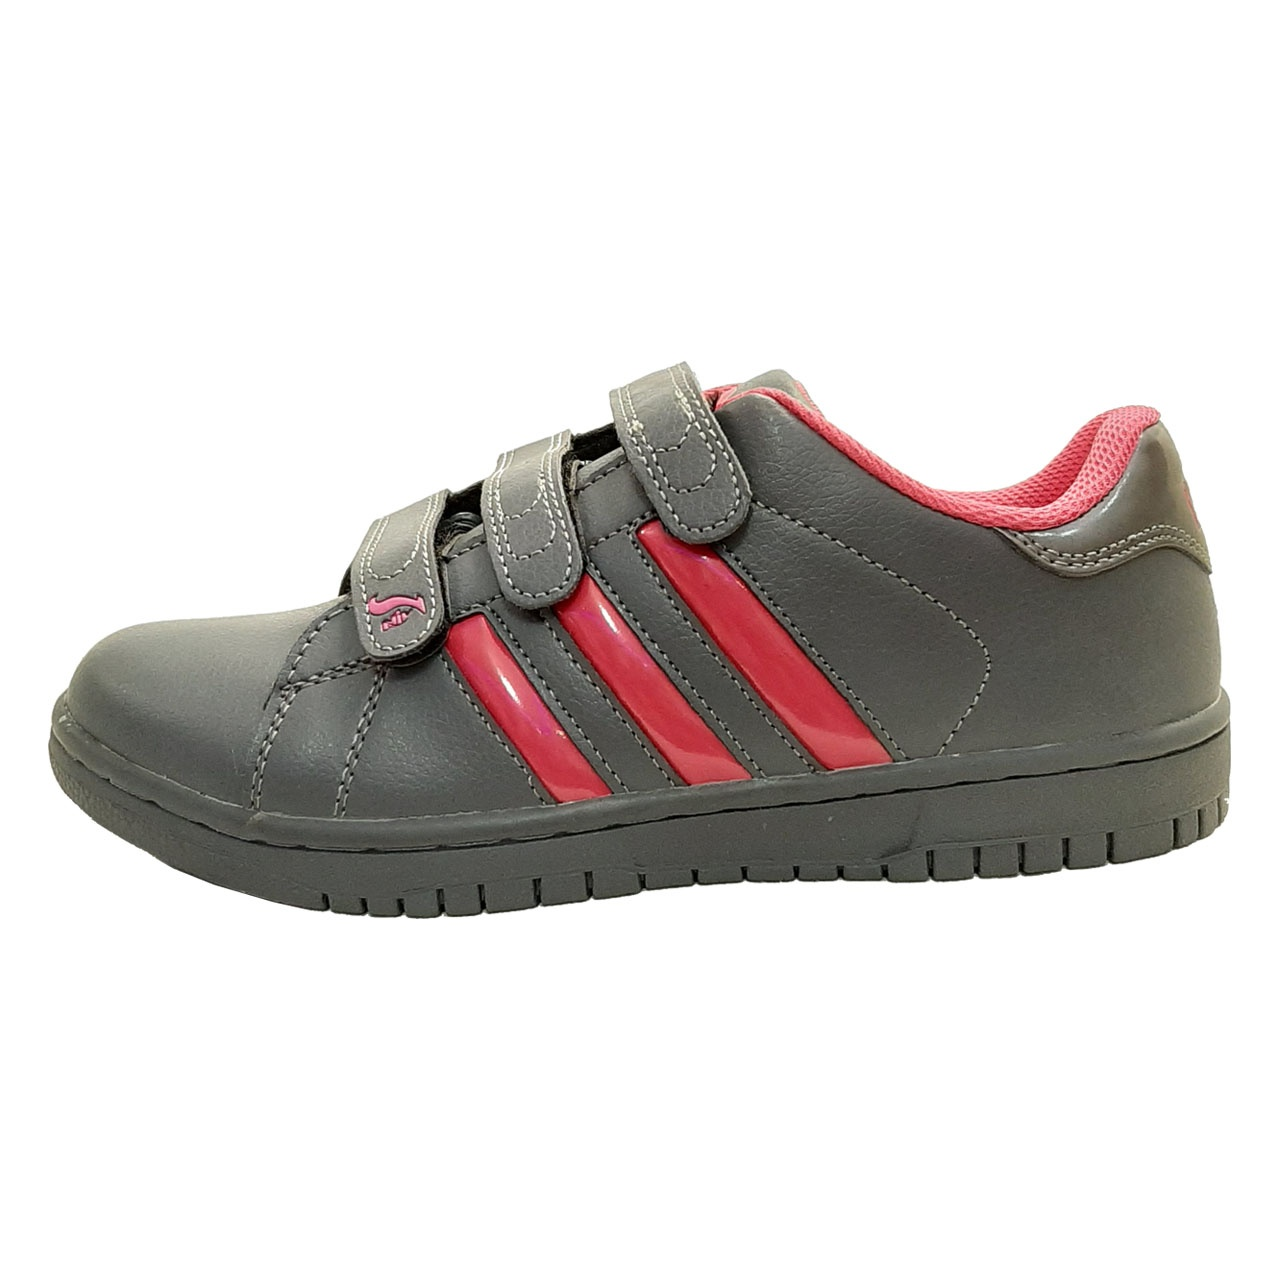 کفش راحتی زنانه ویوا کد N.38